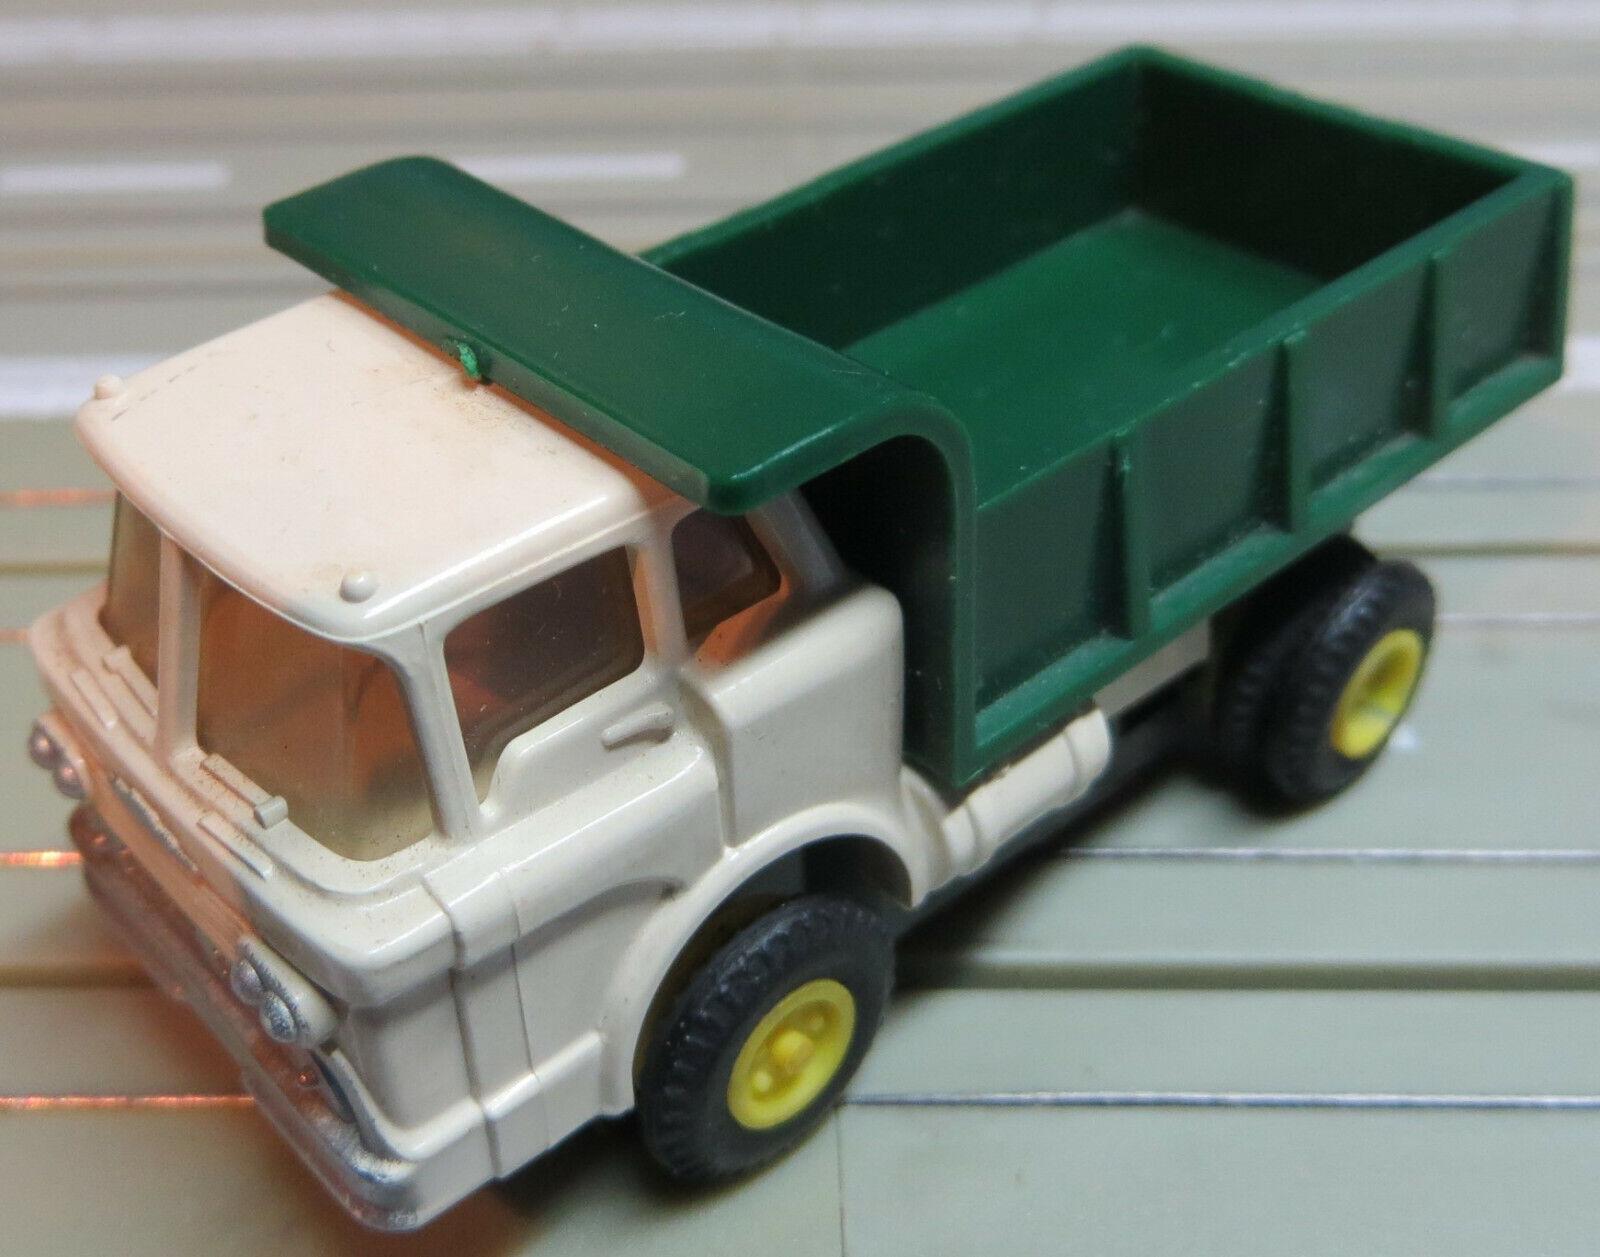 Für H0 SMassecar Racing Modelllbahn -- alter LKW mit T-Jet Motor